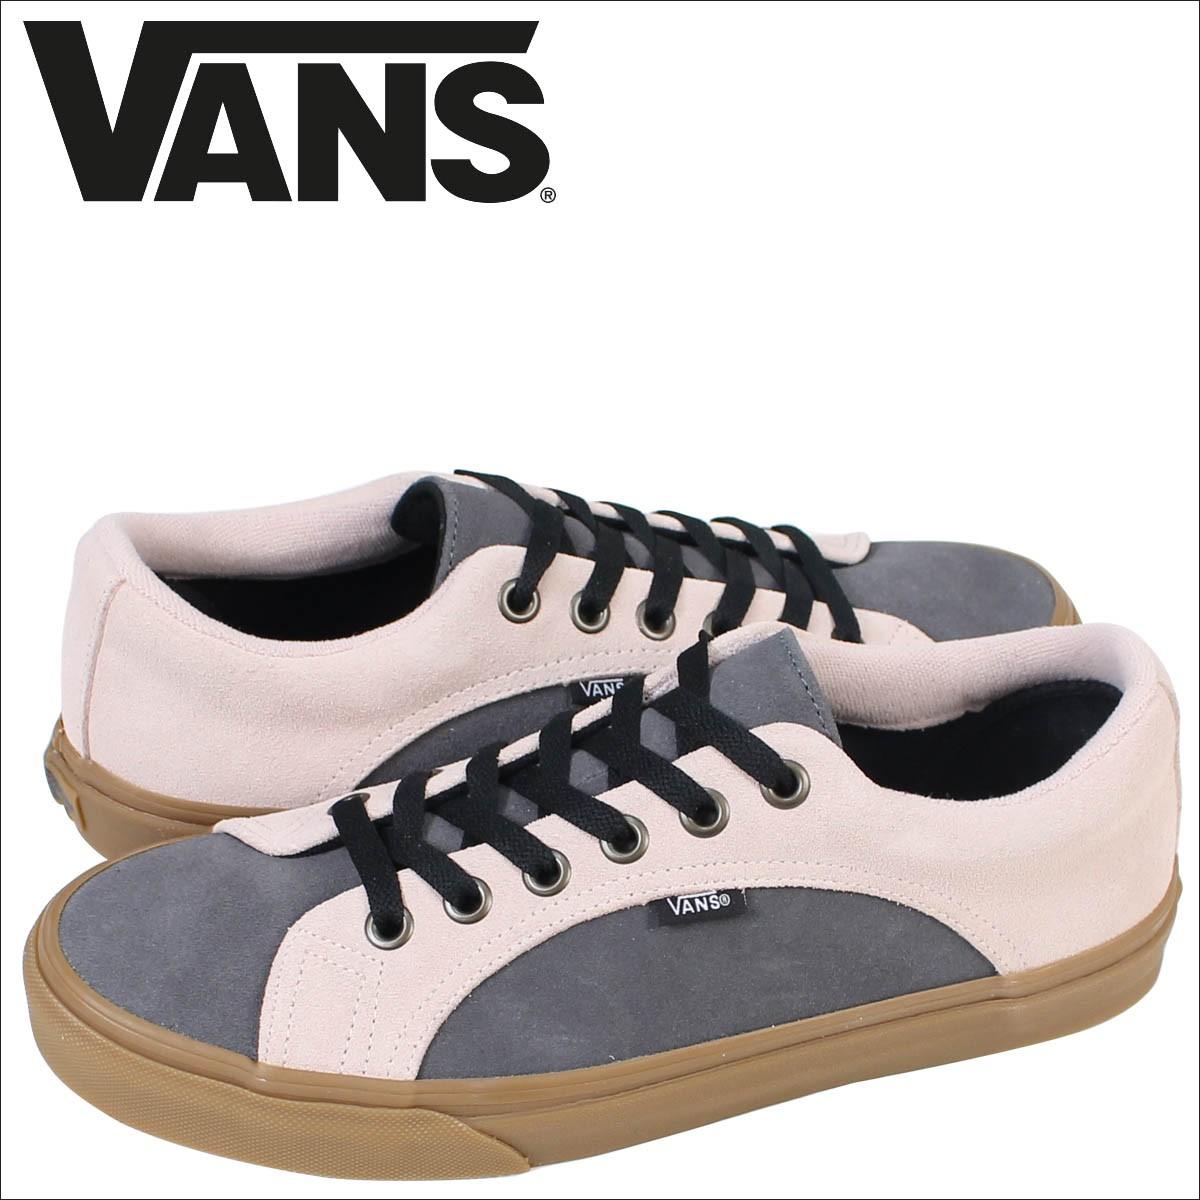 VANS ランピン スニーカー メンズ バンズ ヴァンズ LAMPIN VN0A38FIOIO 靴 ピンク